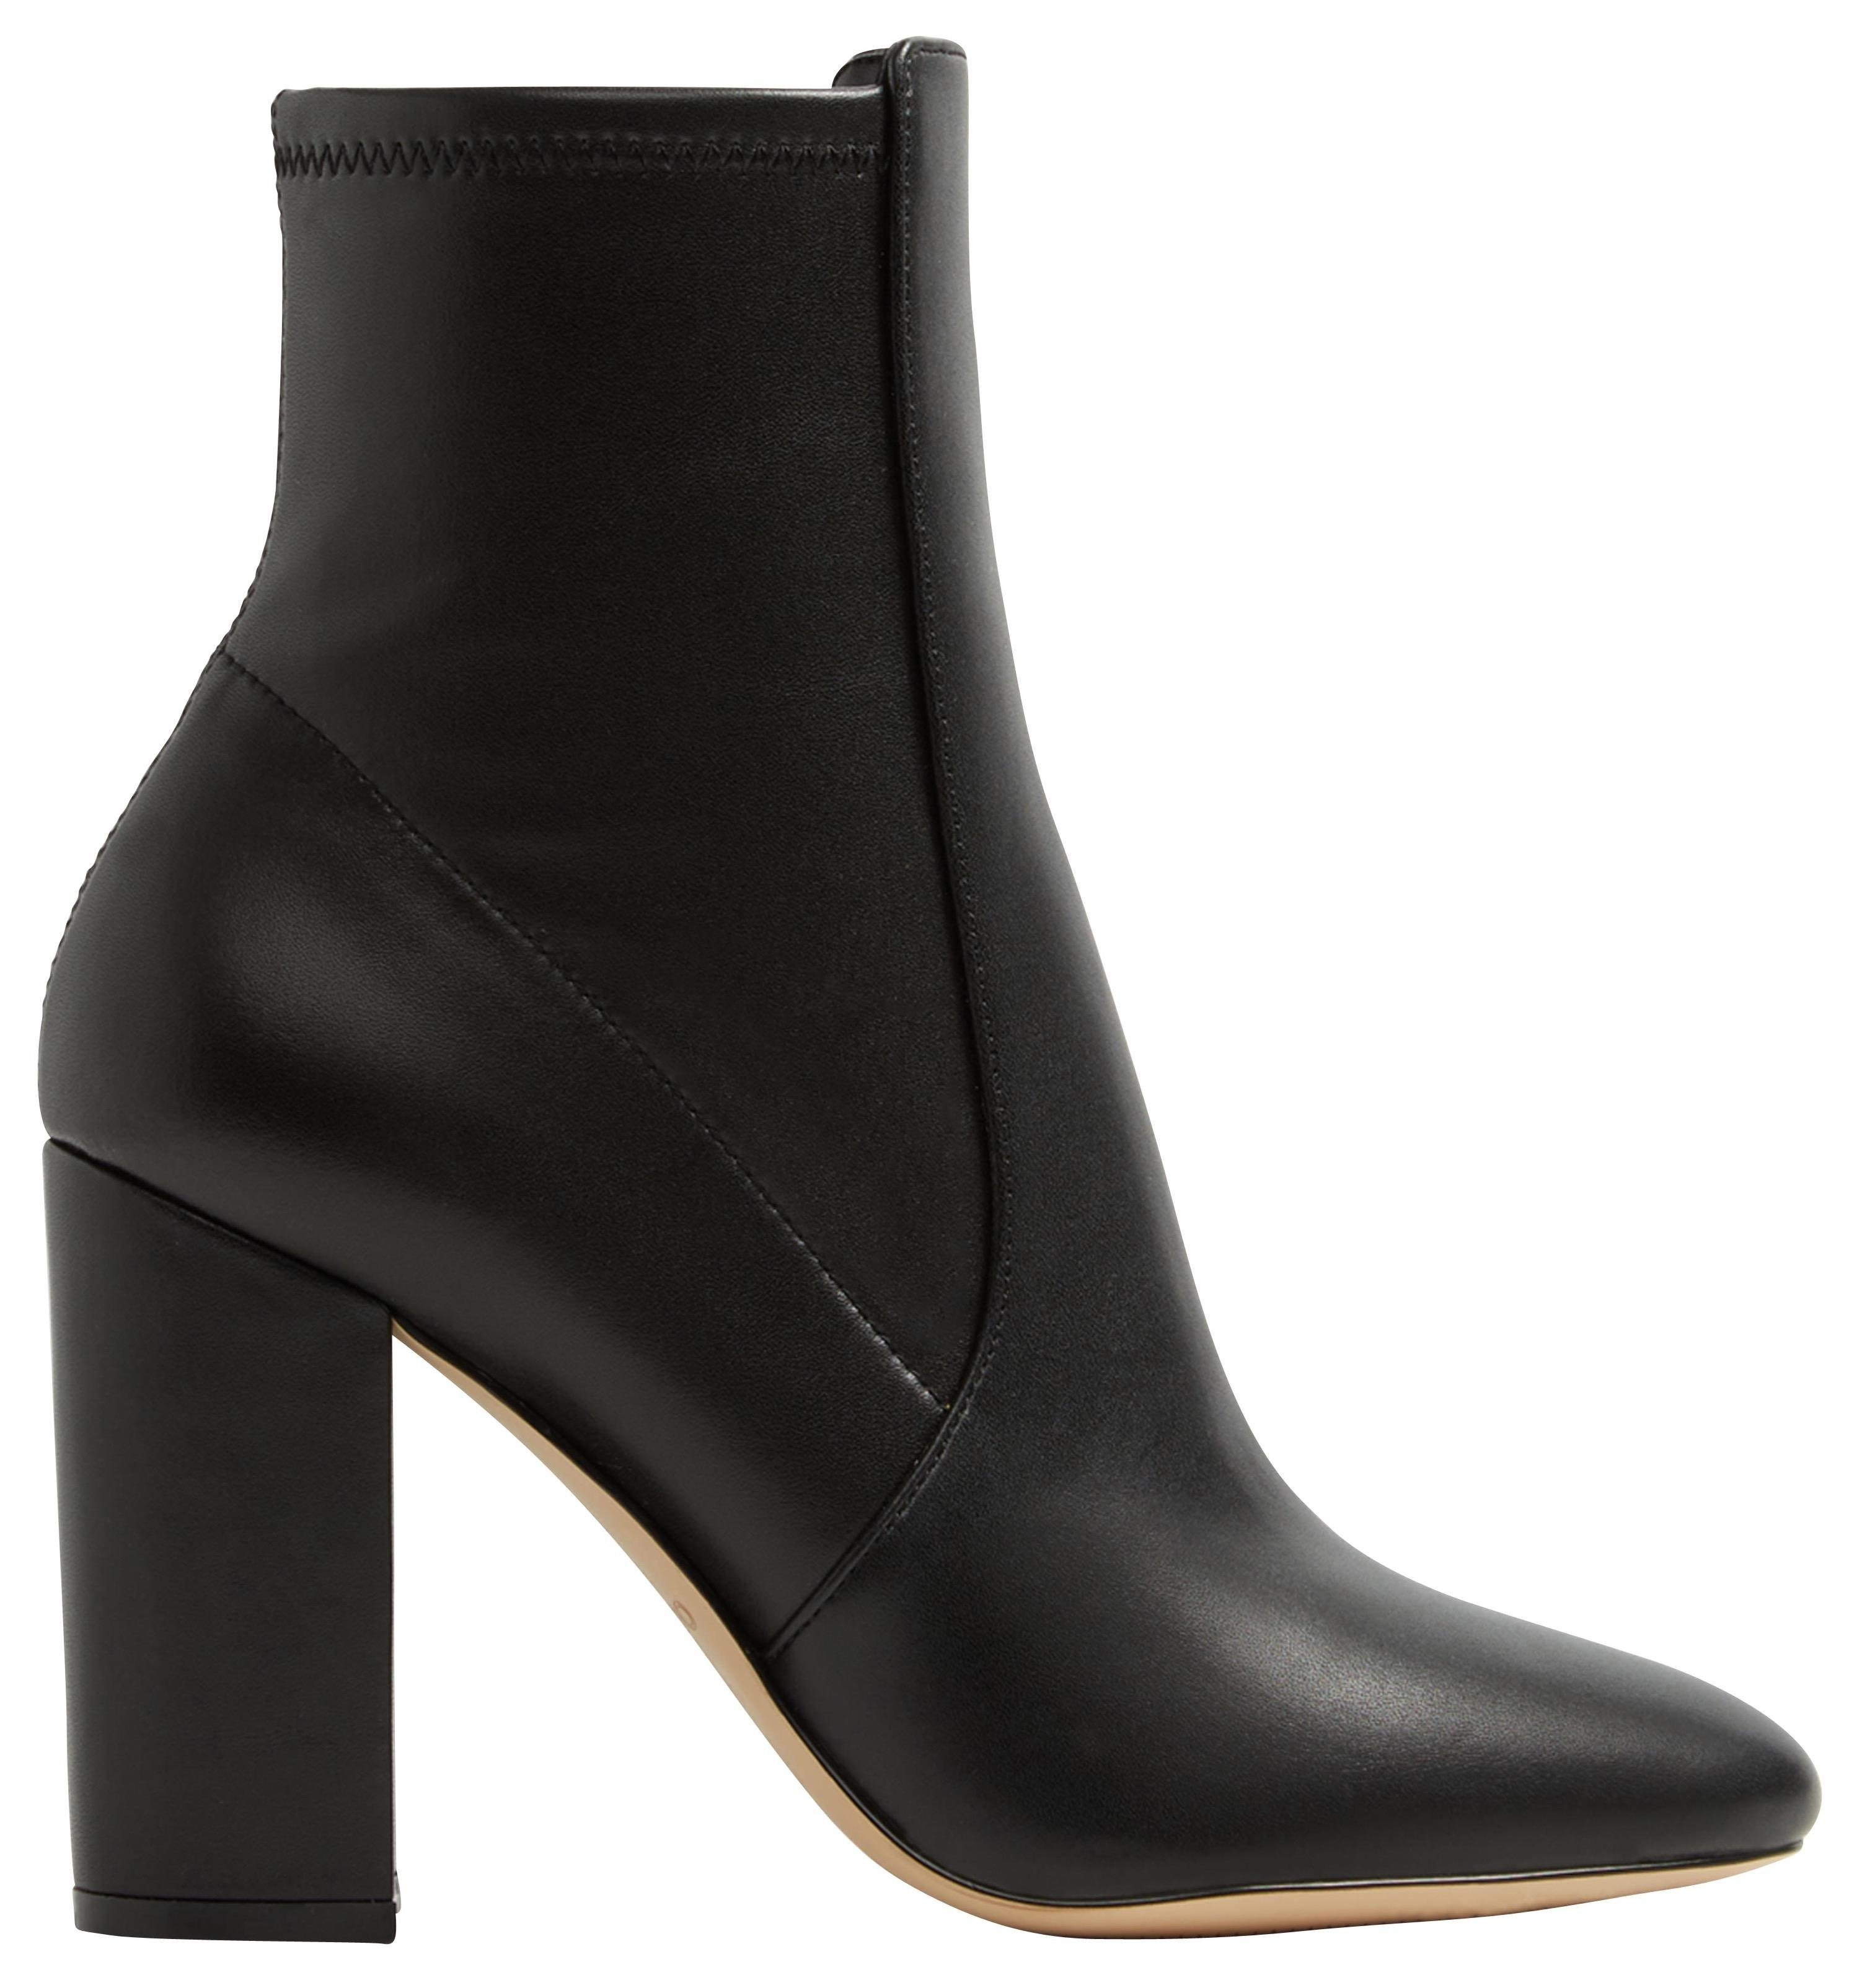 ALDO »Aurellia« High-Heel-Stiefelette im femininen Look